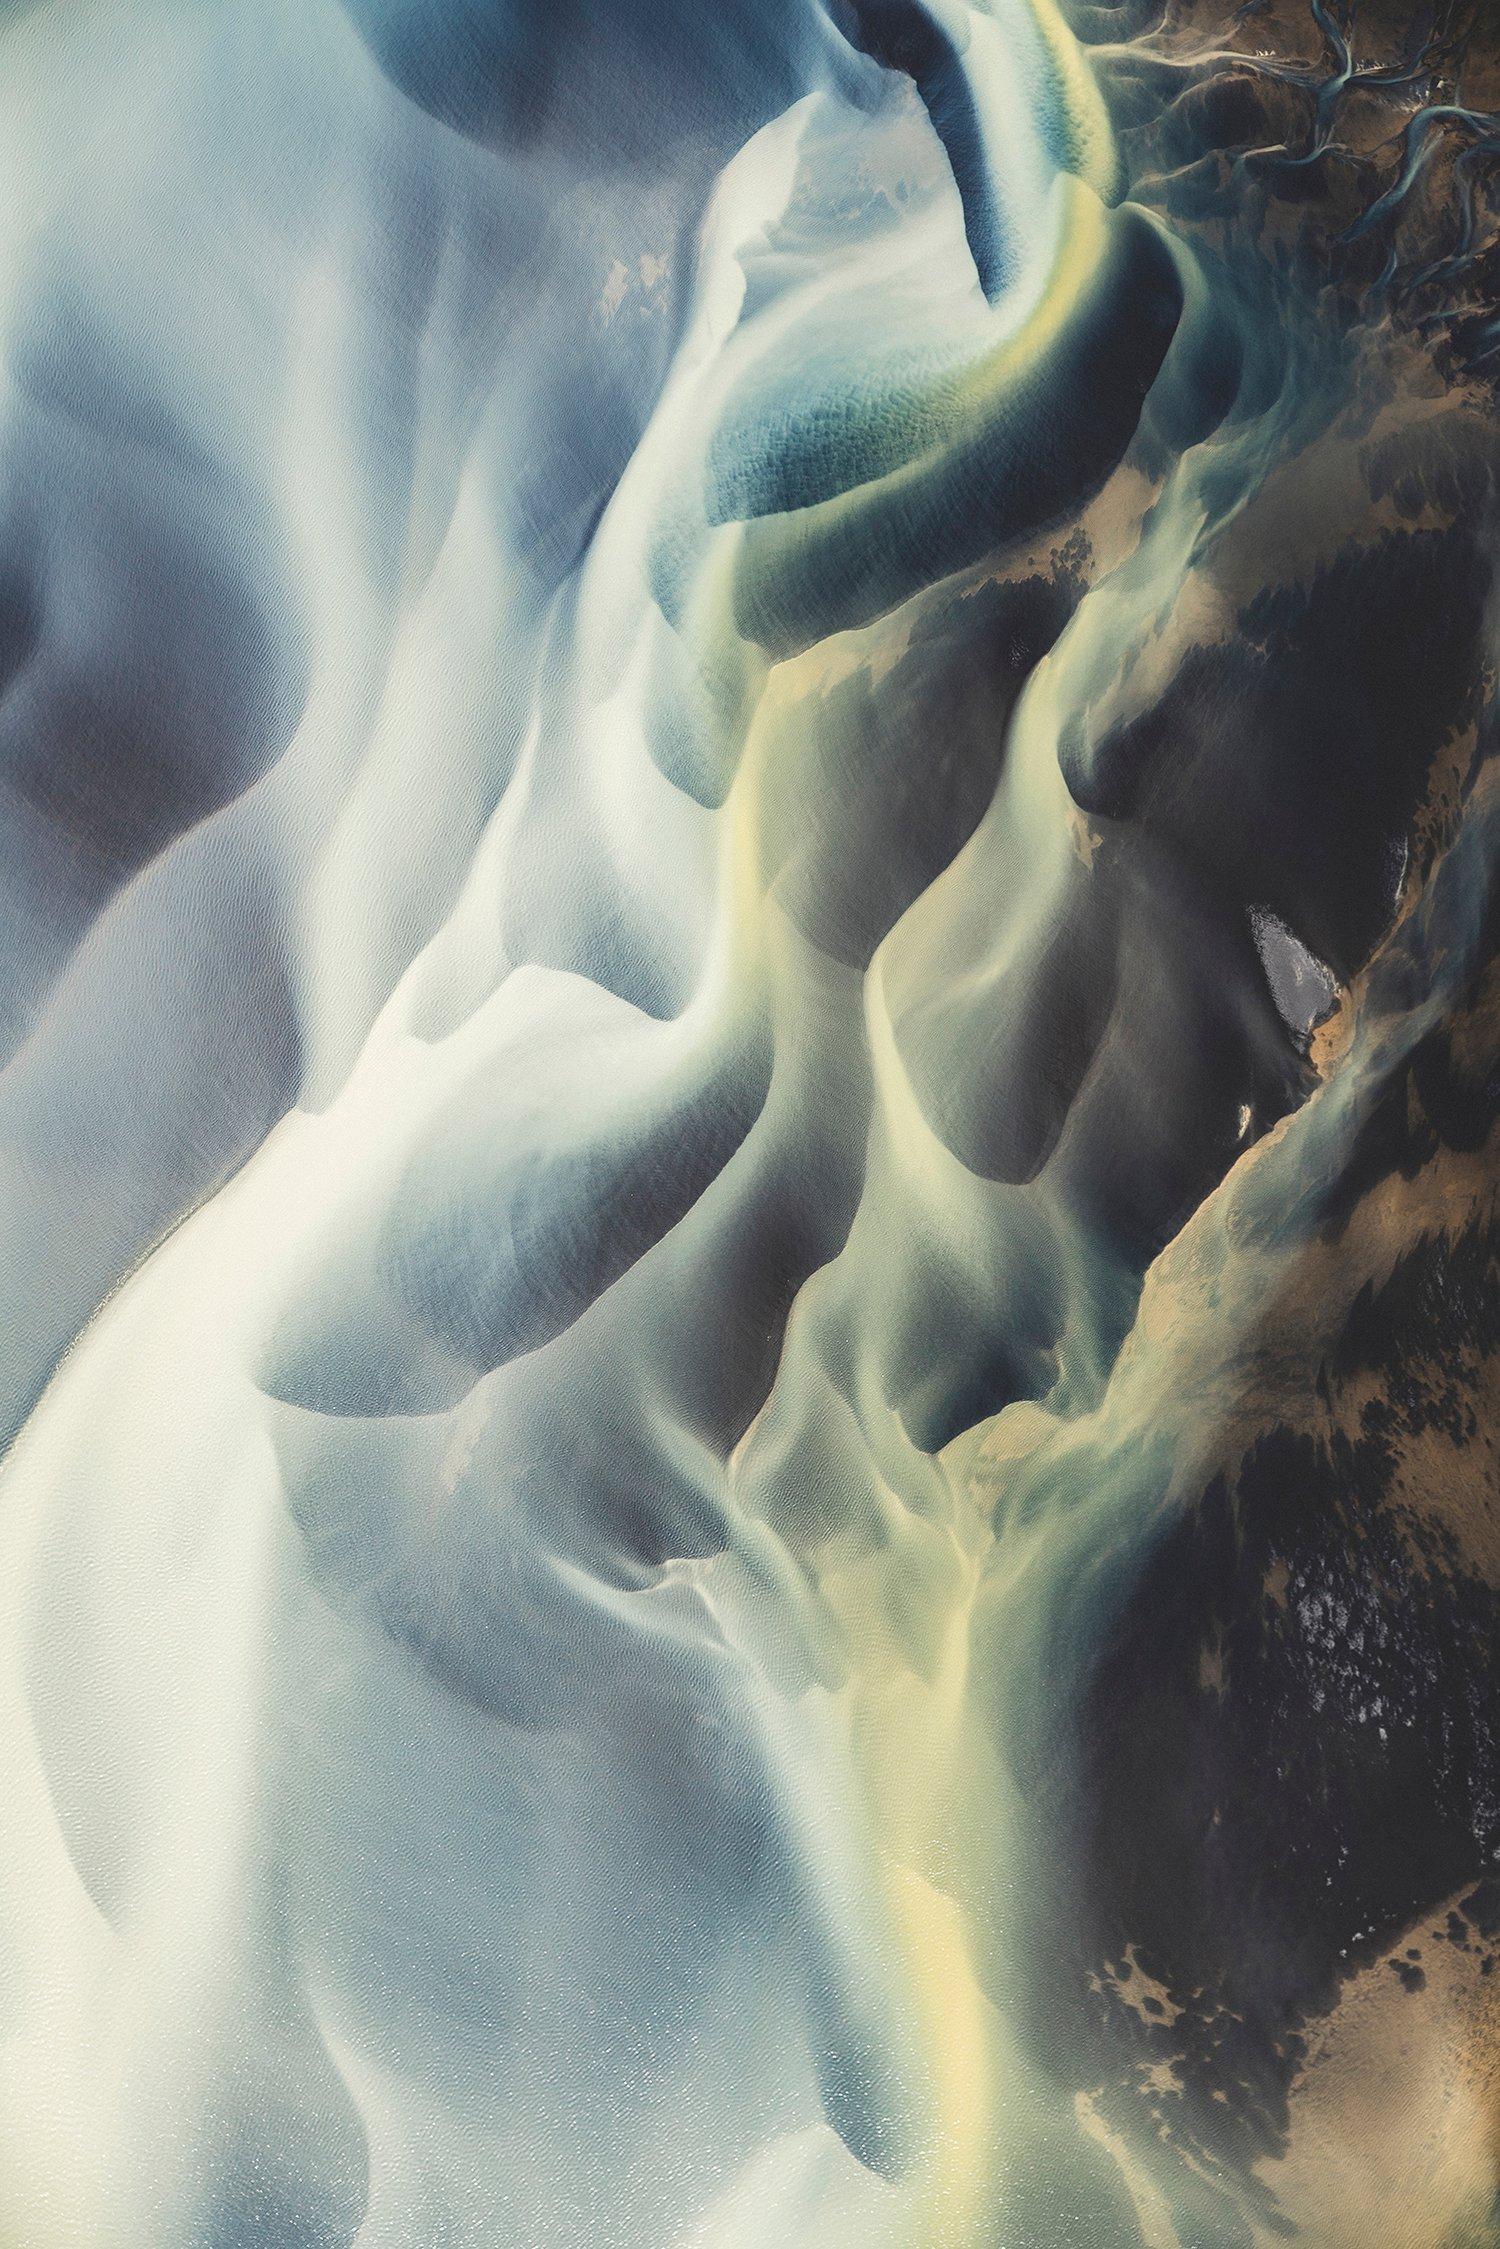 Image of The Icelandic Highlands // Roman Königshofer